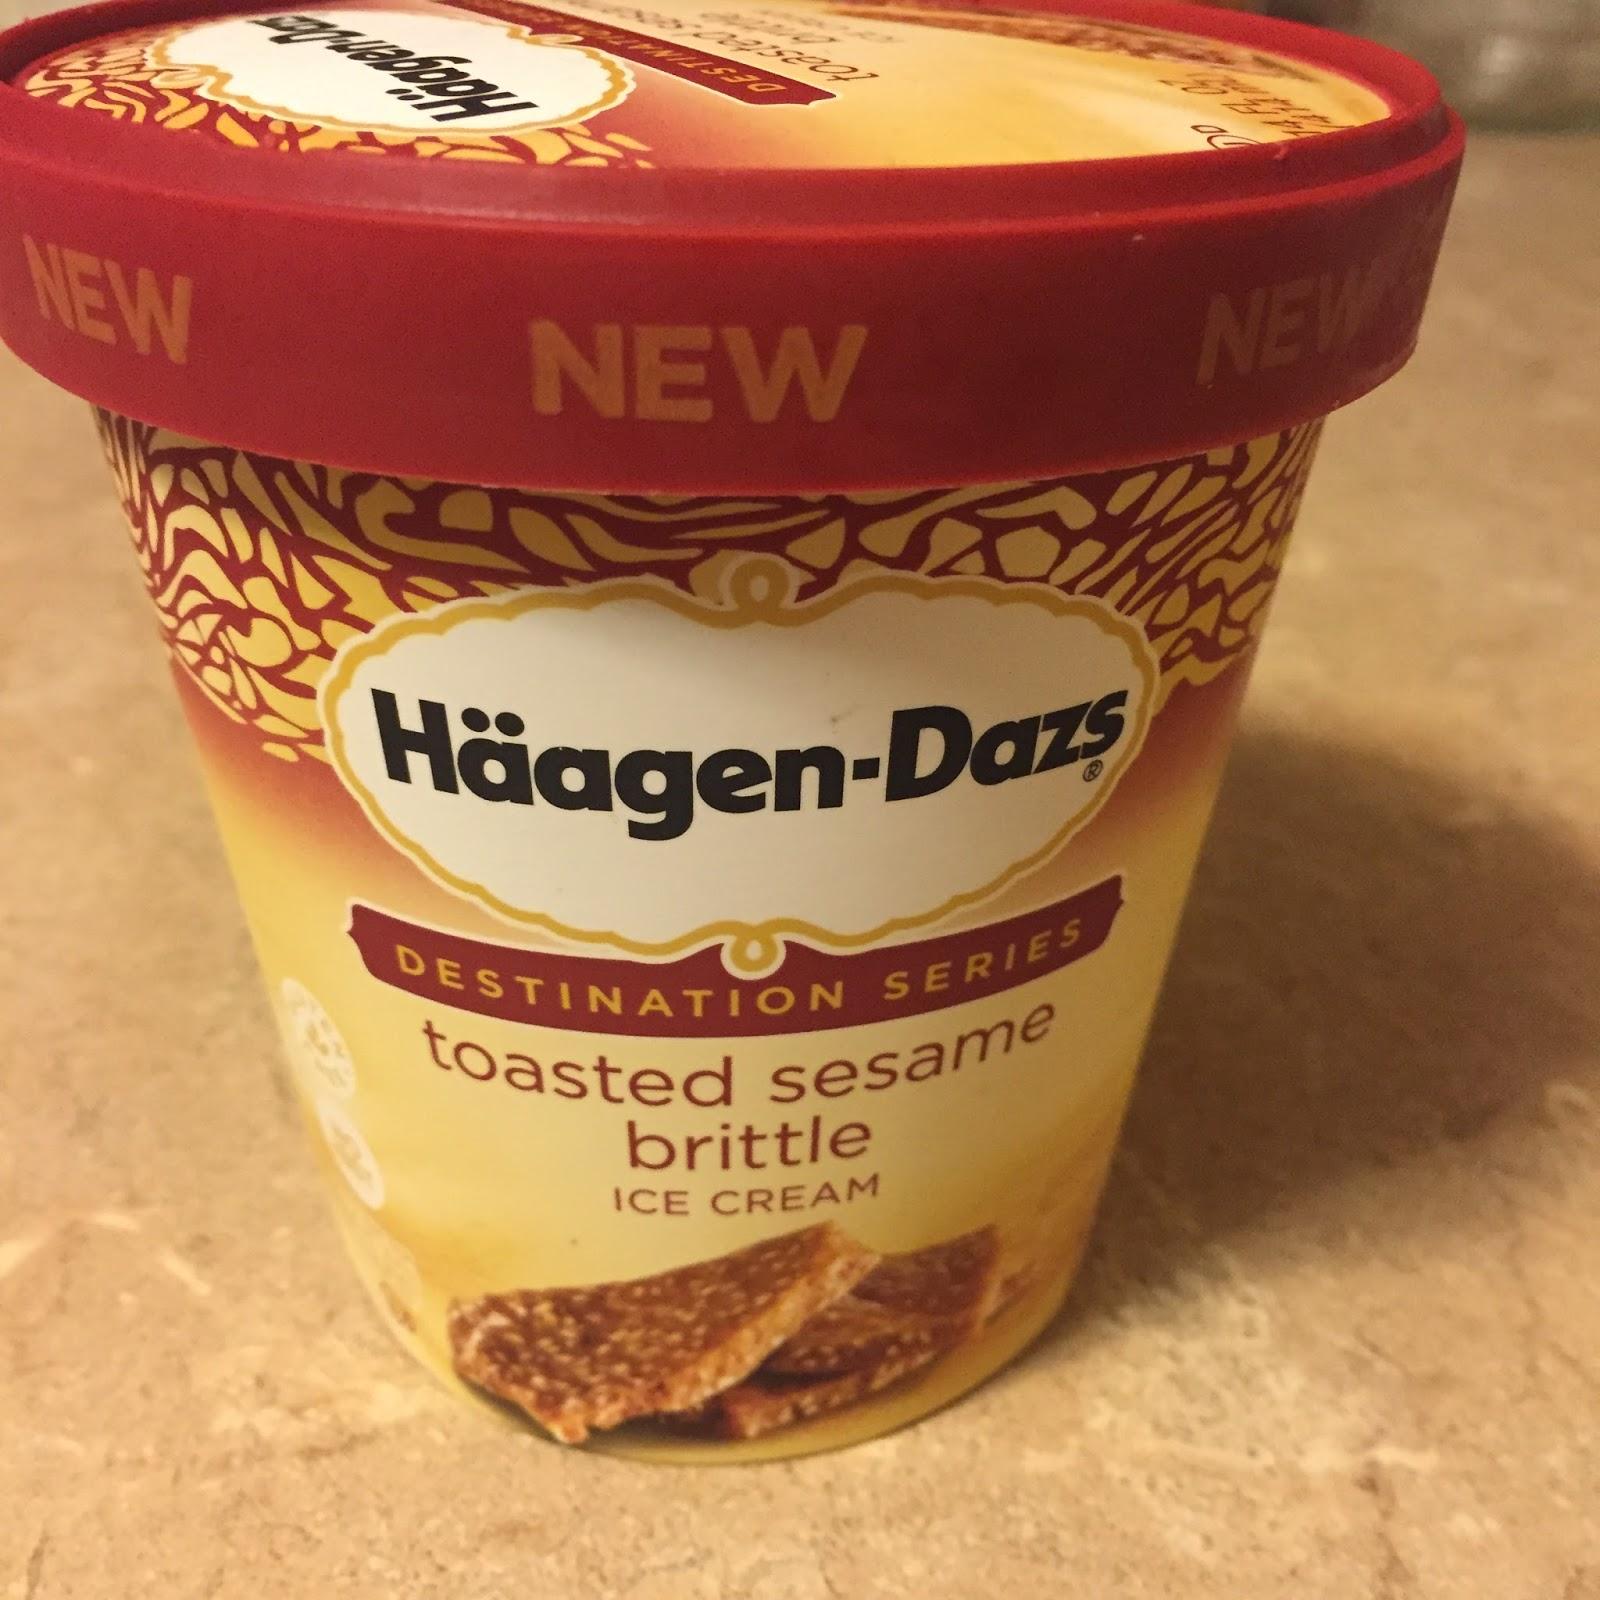 The Big Muddy Ice Cream Blog: Haagen-Dazs Toasted Sesame Brittle